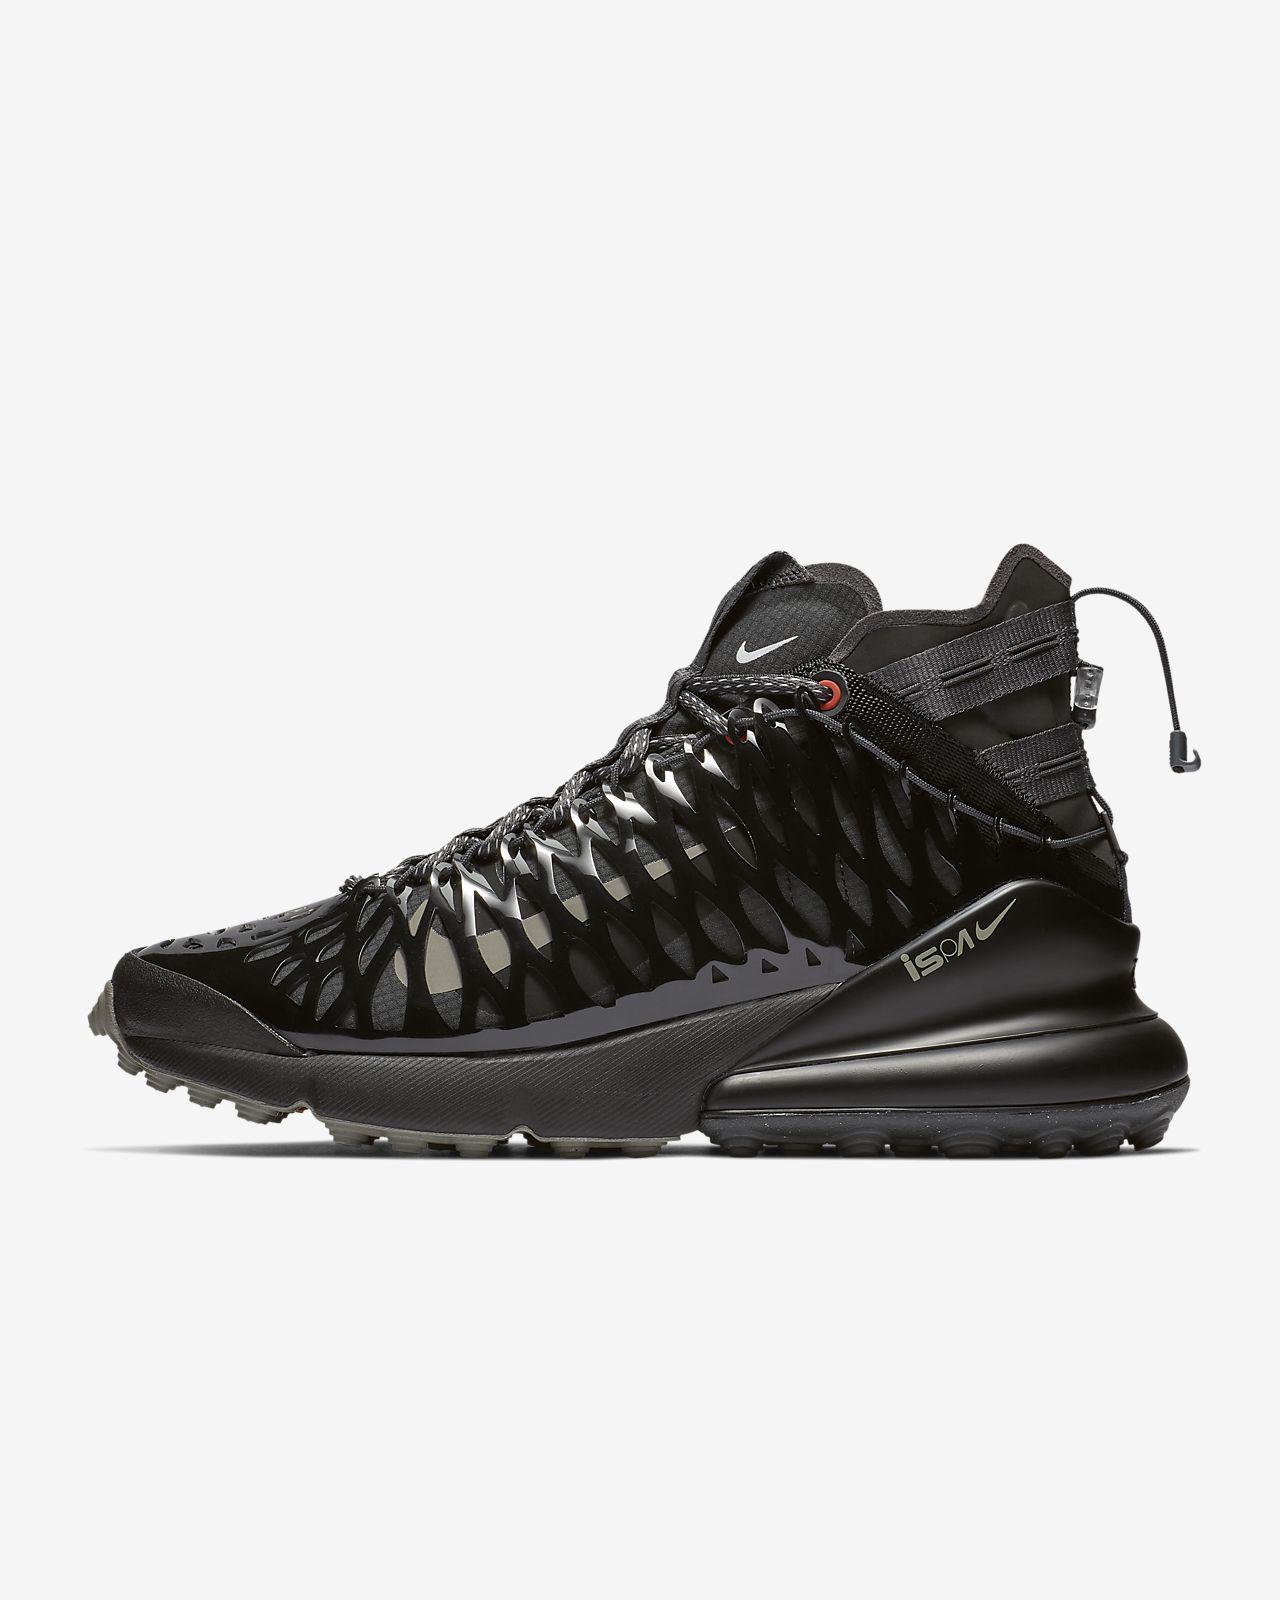 promo code e8a62 60789 ... Buty męskie Nike Air Max 270 ISPA